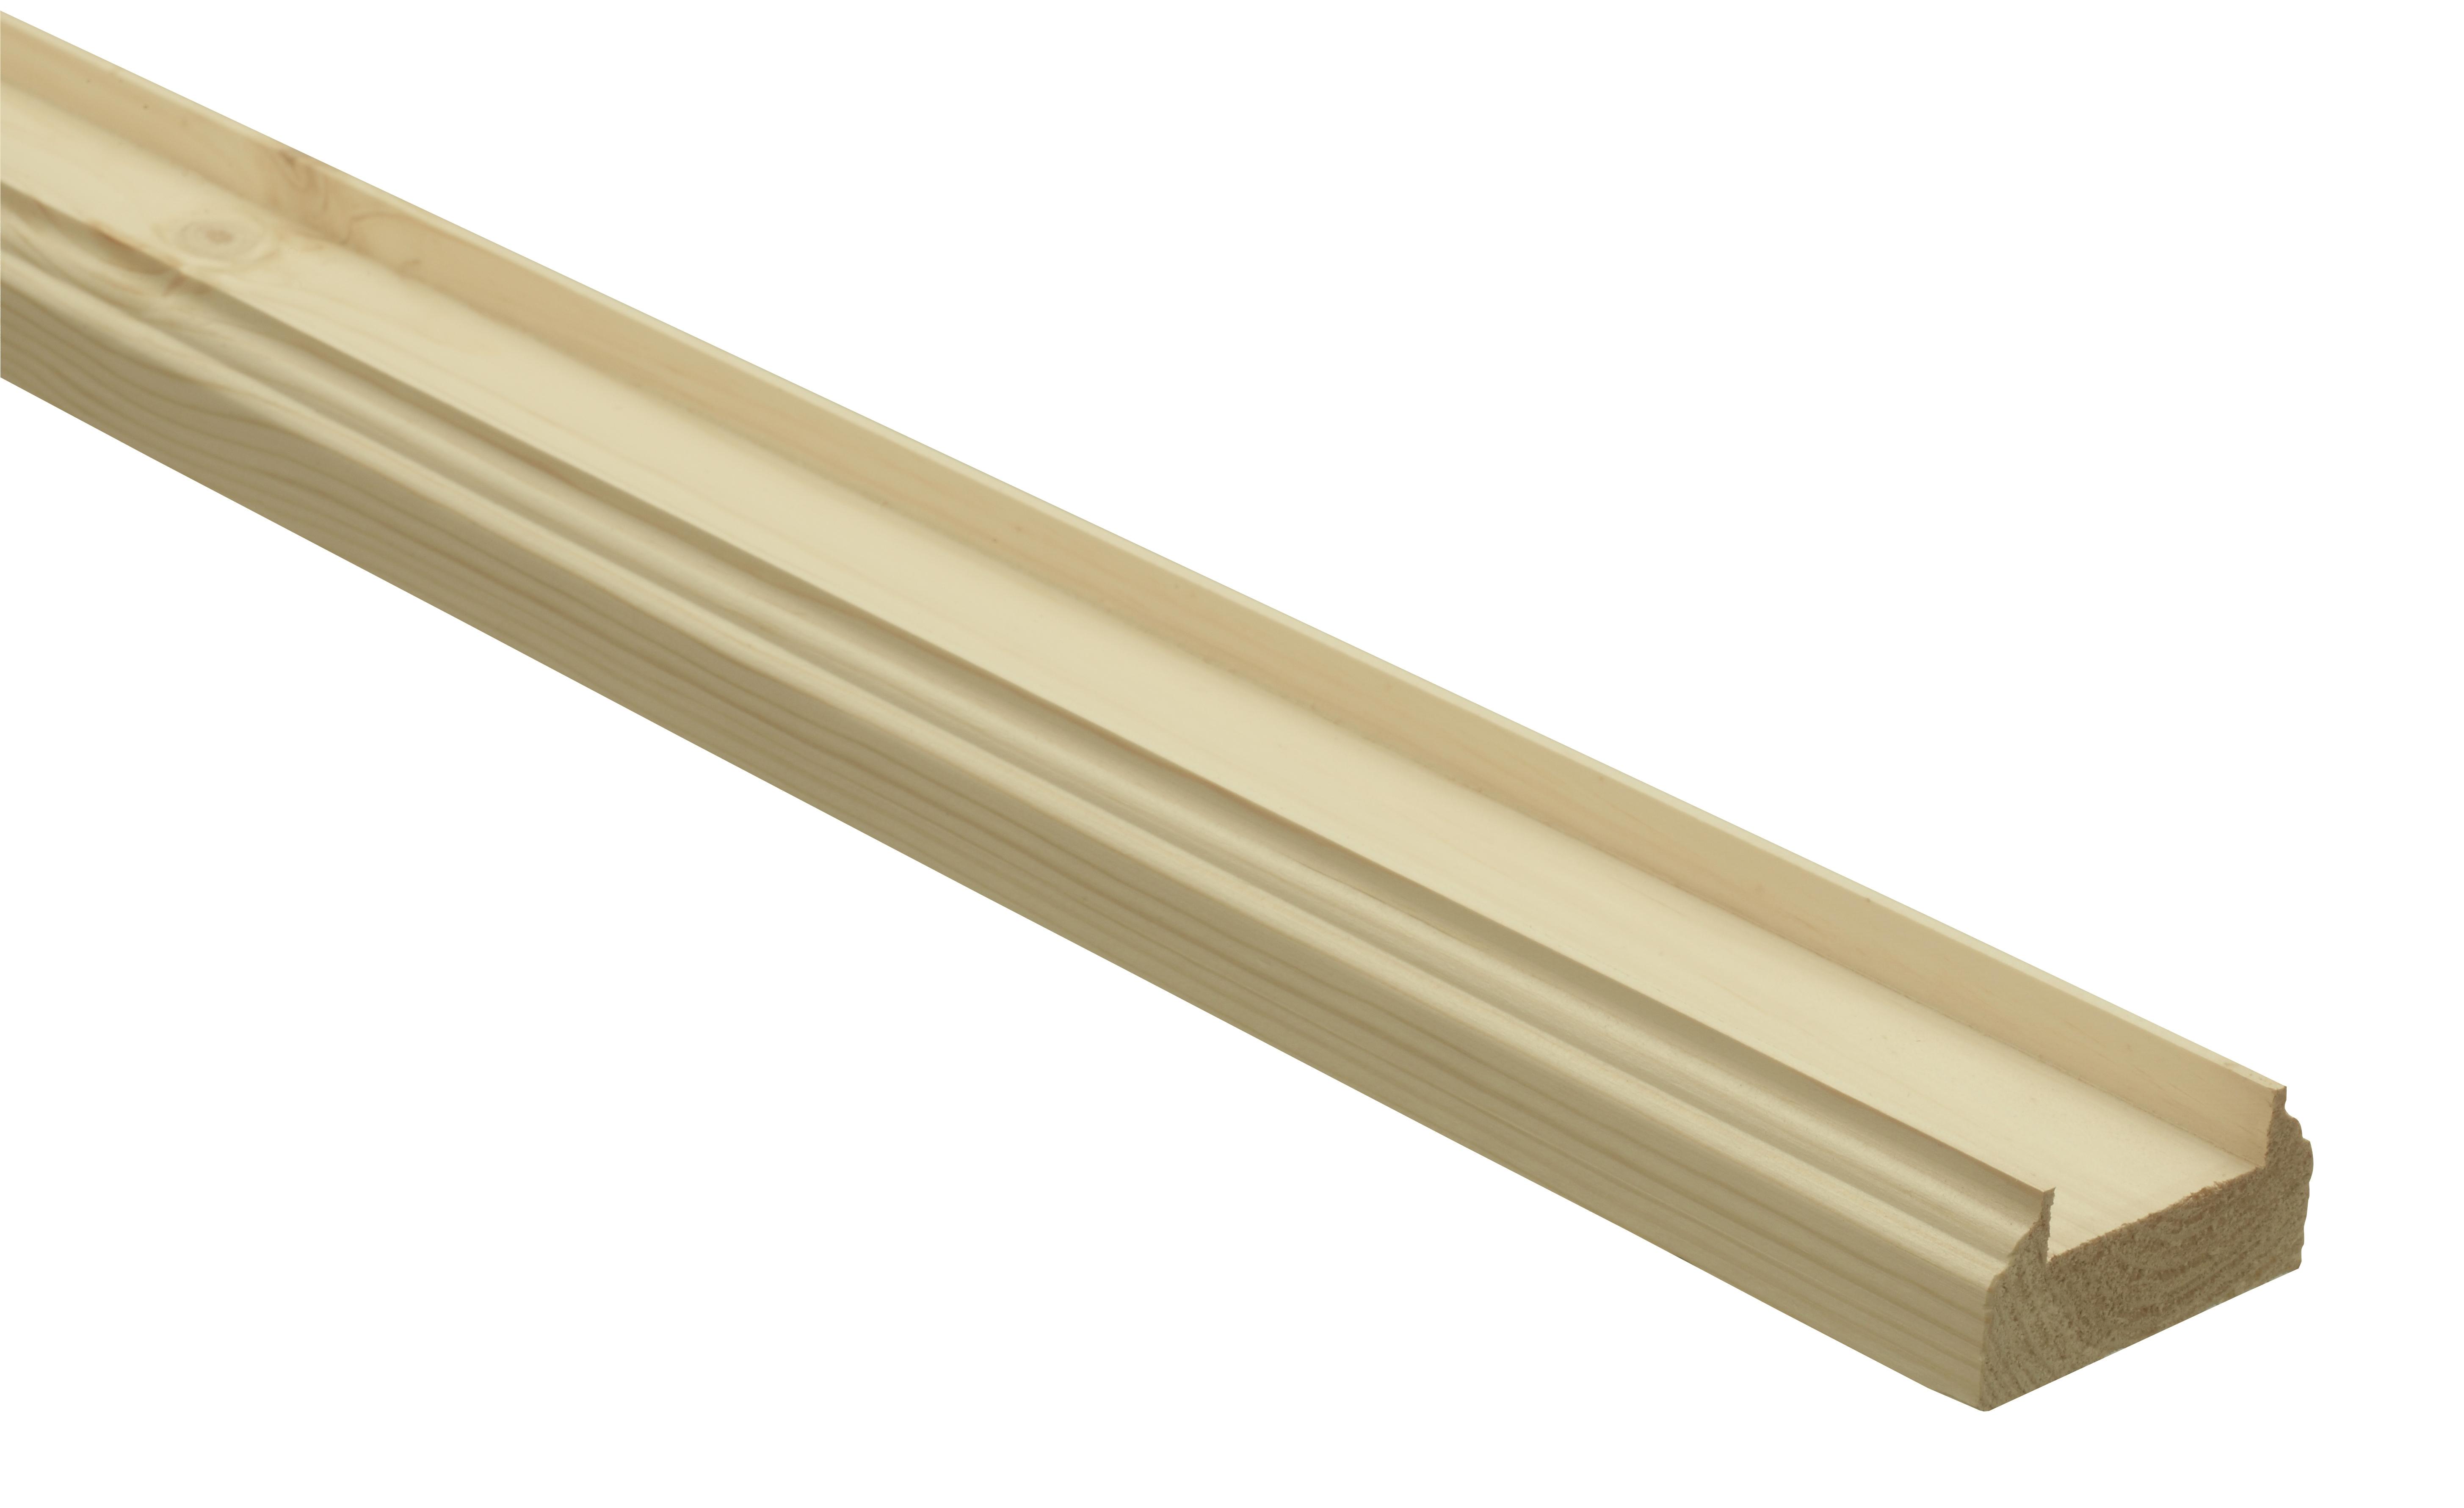 1 Pine Baserail Prof 4200 41PS